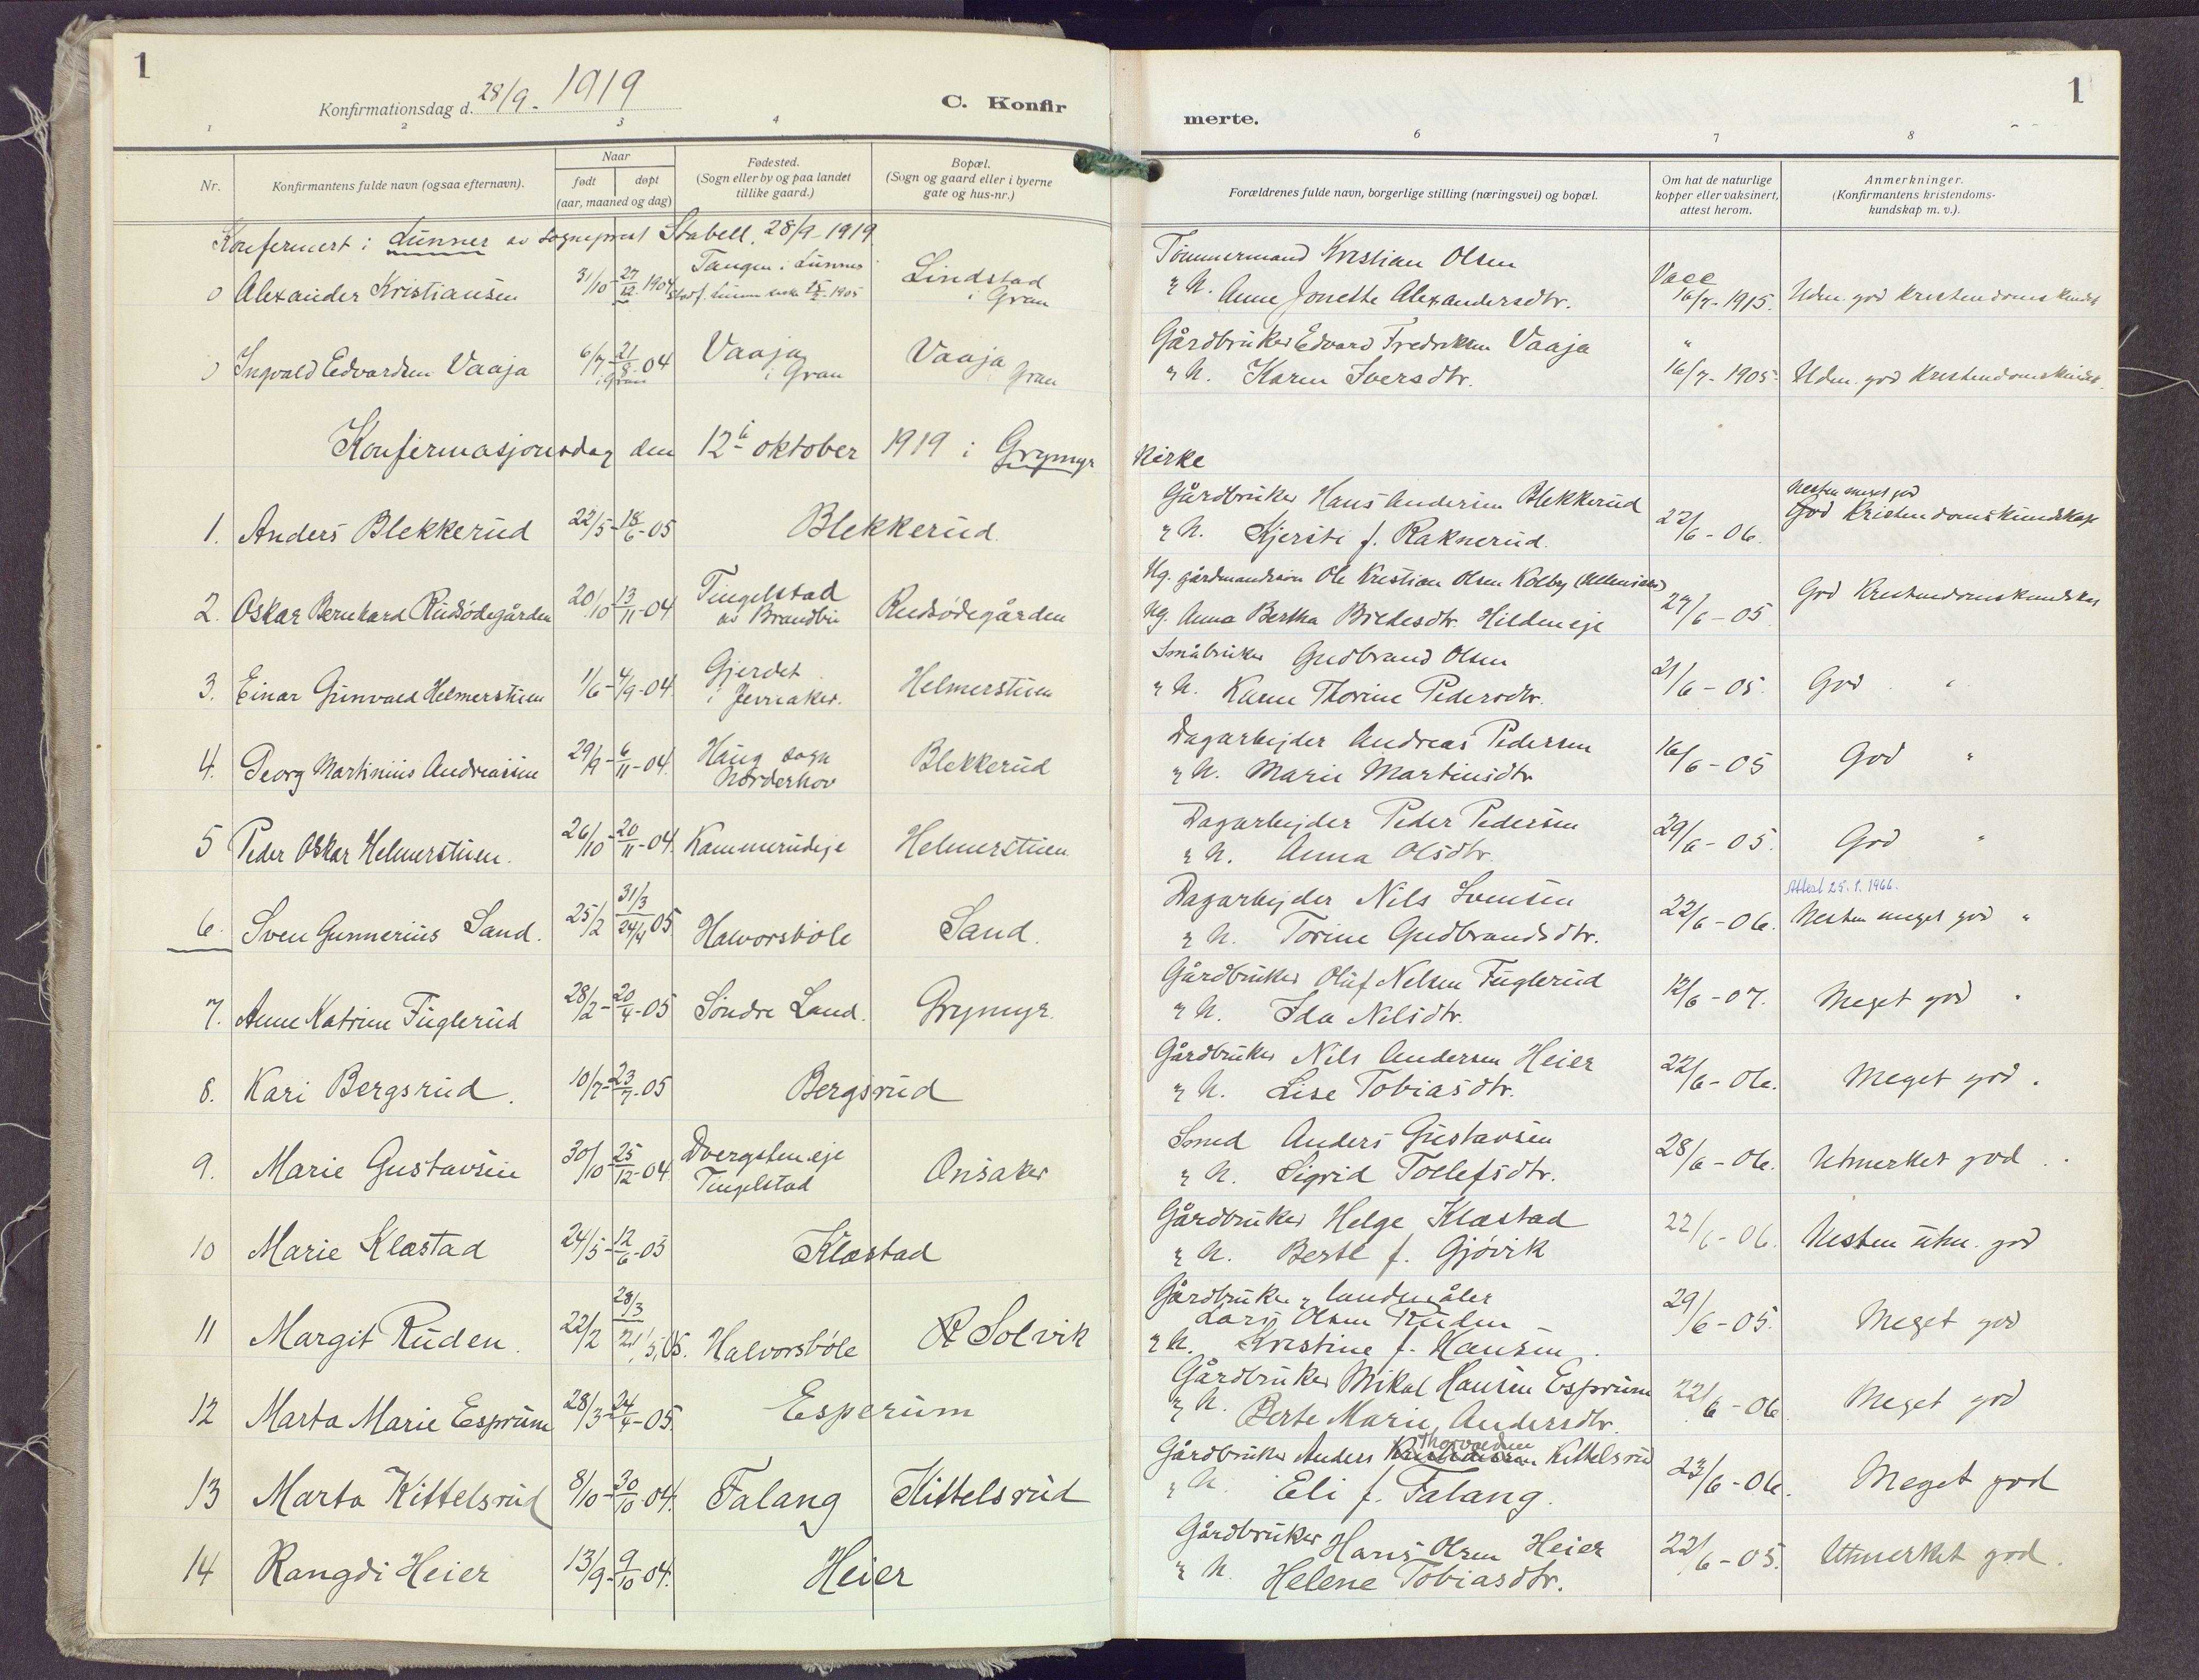 SAH, Gran prestekontor, Ministerialbok nr. 23, 1919-1938, s. 1